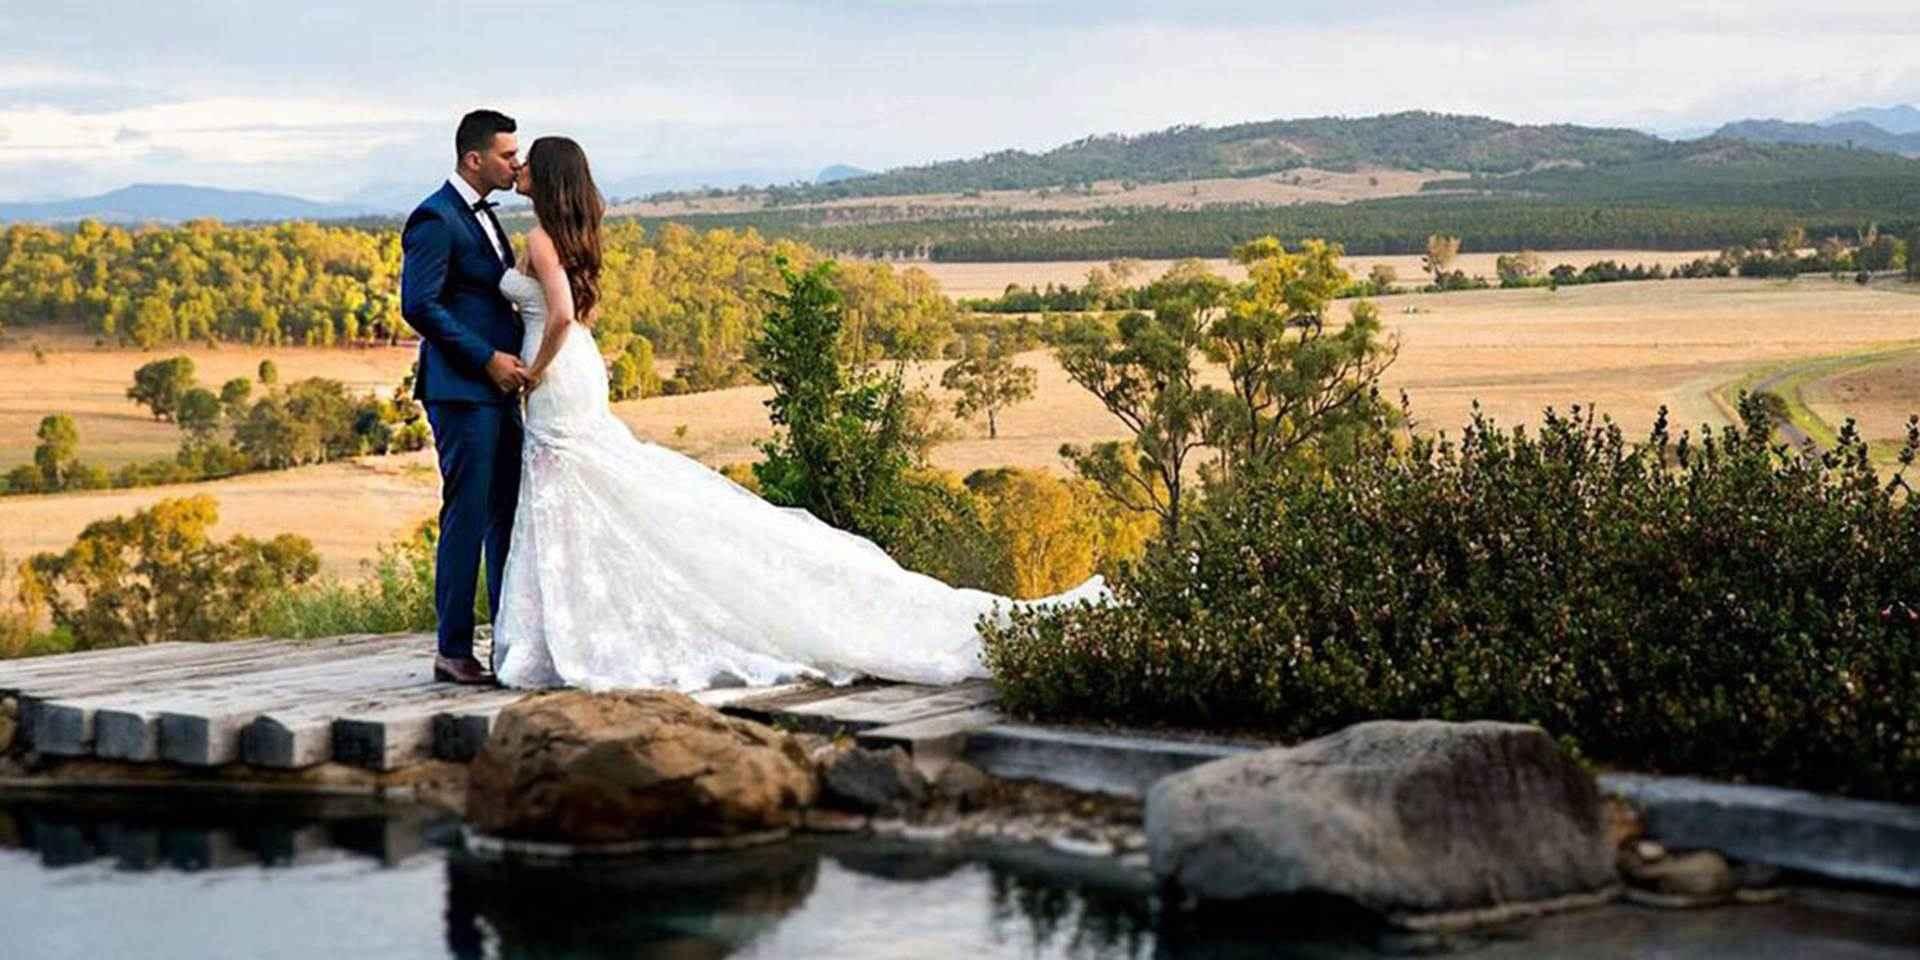 Wedding Venue - Spicers Hidden Vale 13 on Veilability